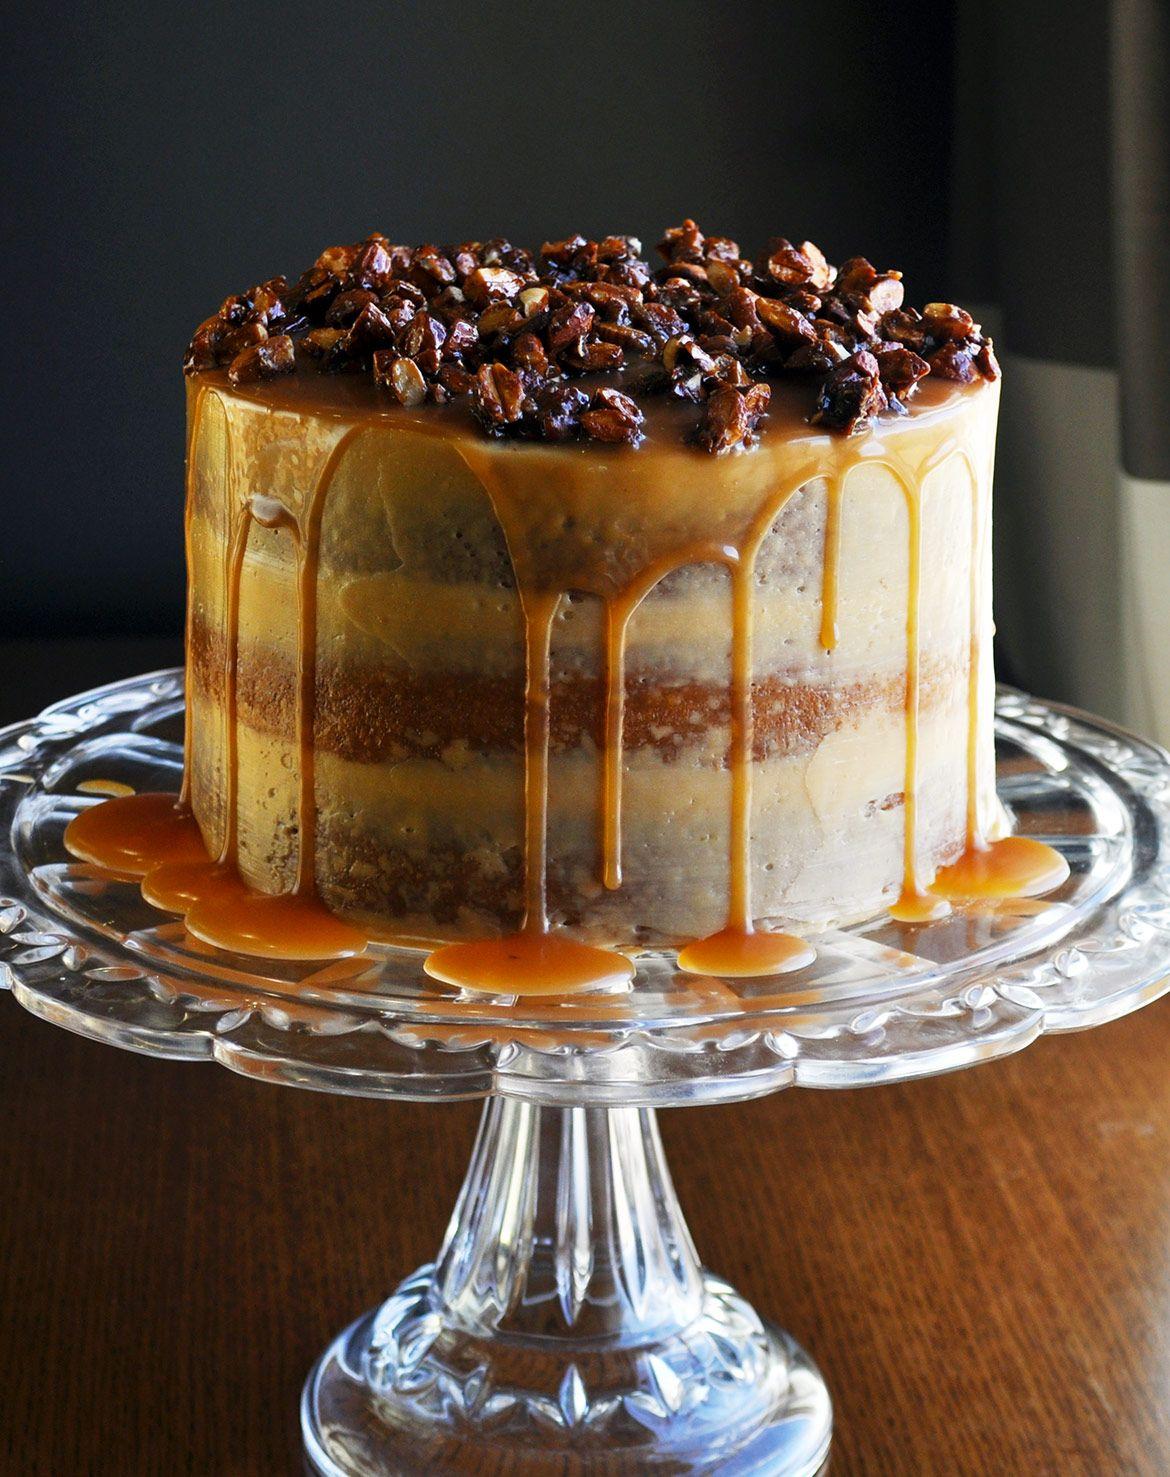 Miraculous Gluten Free Caramel Cake With Salted Caramel Italian Meringue Funny Birthday Cards Online Inifofree Goldxyz